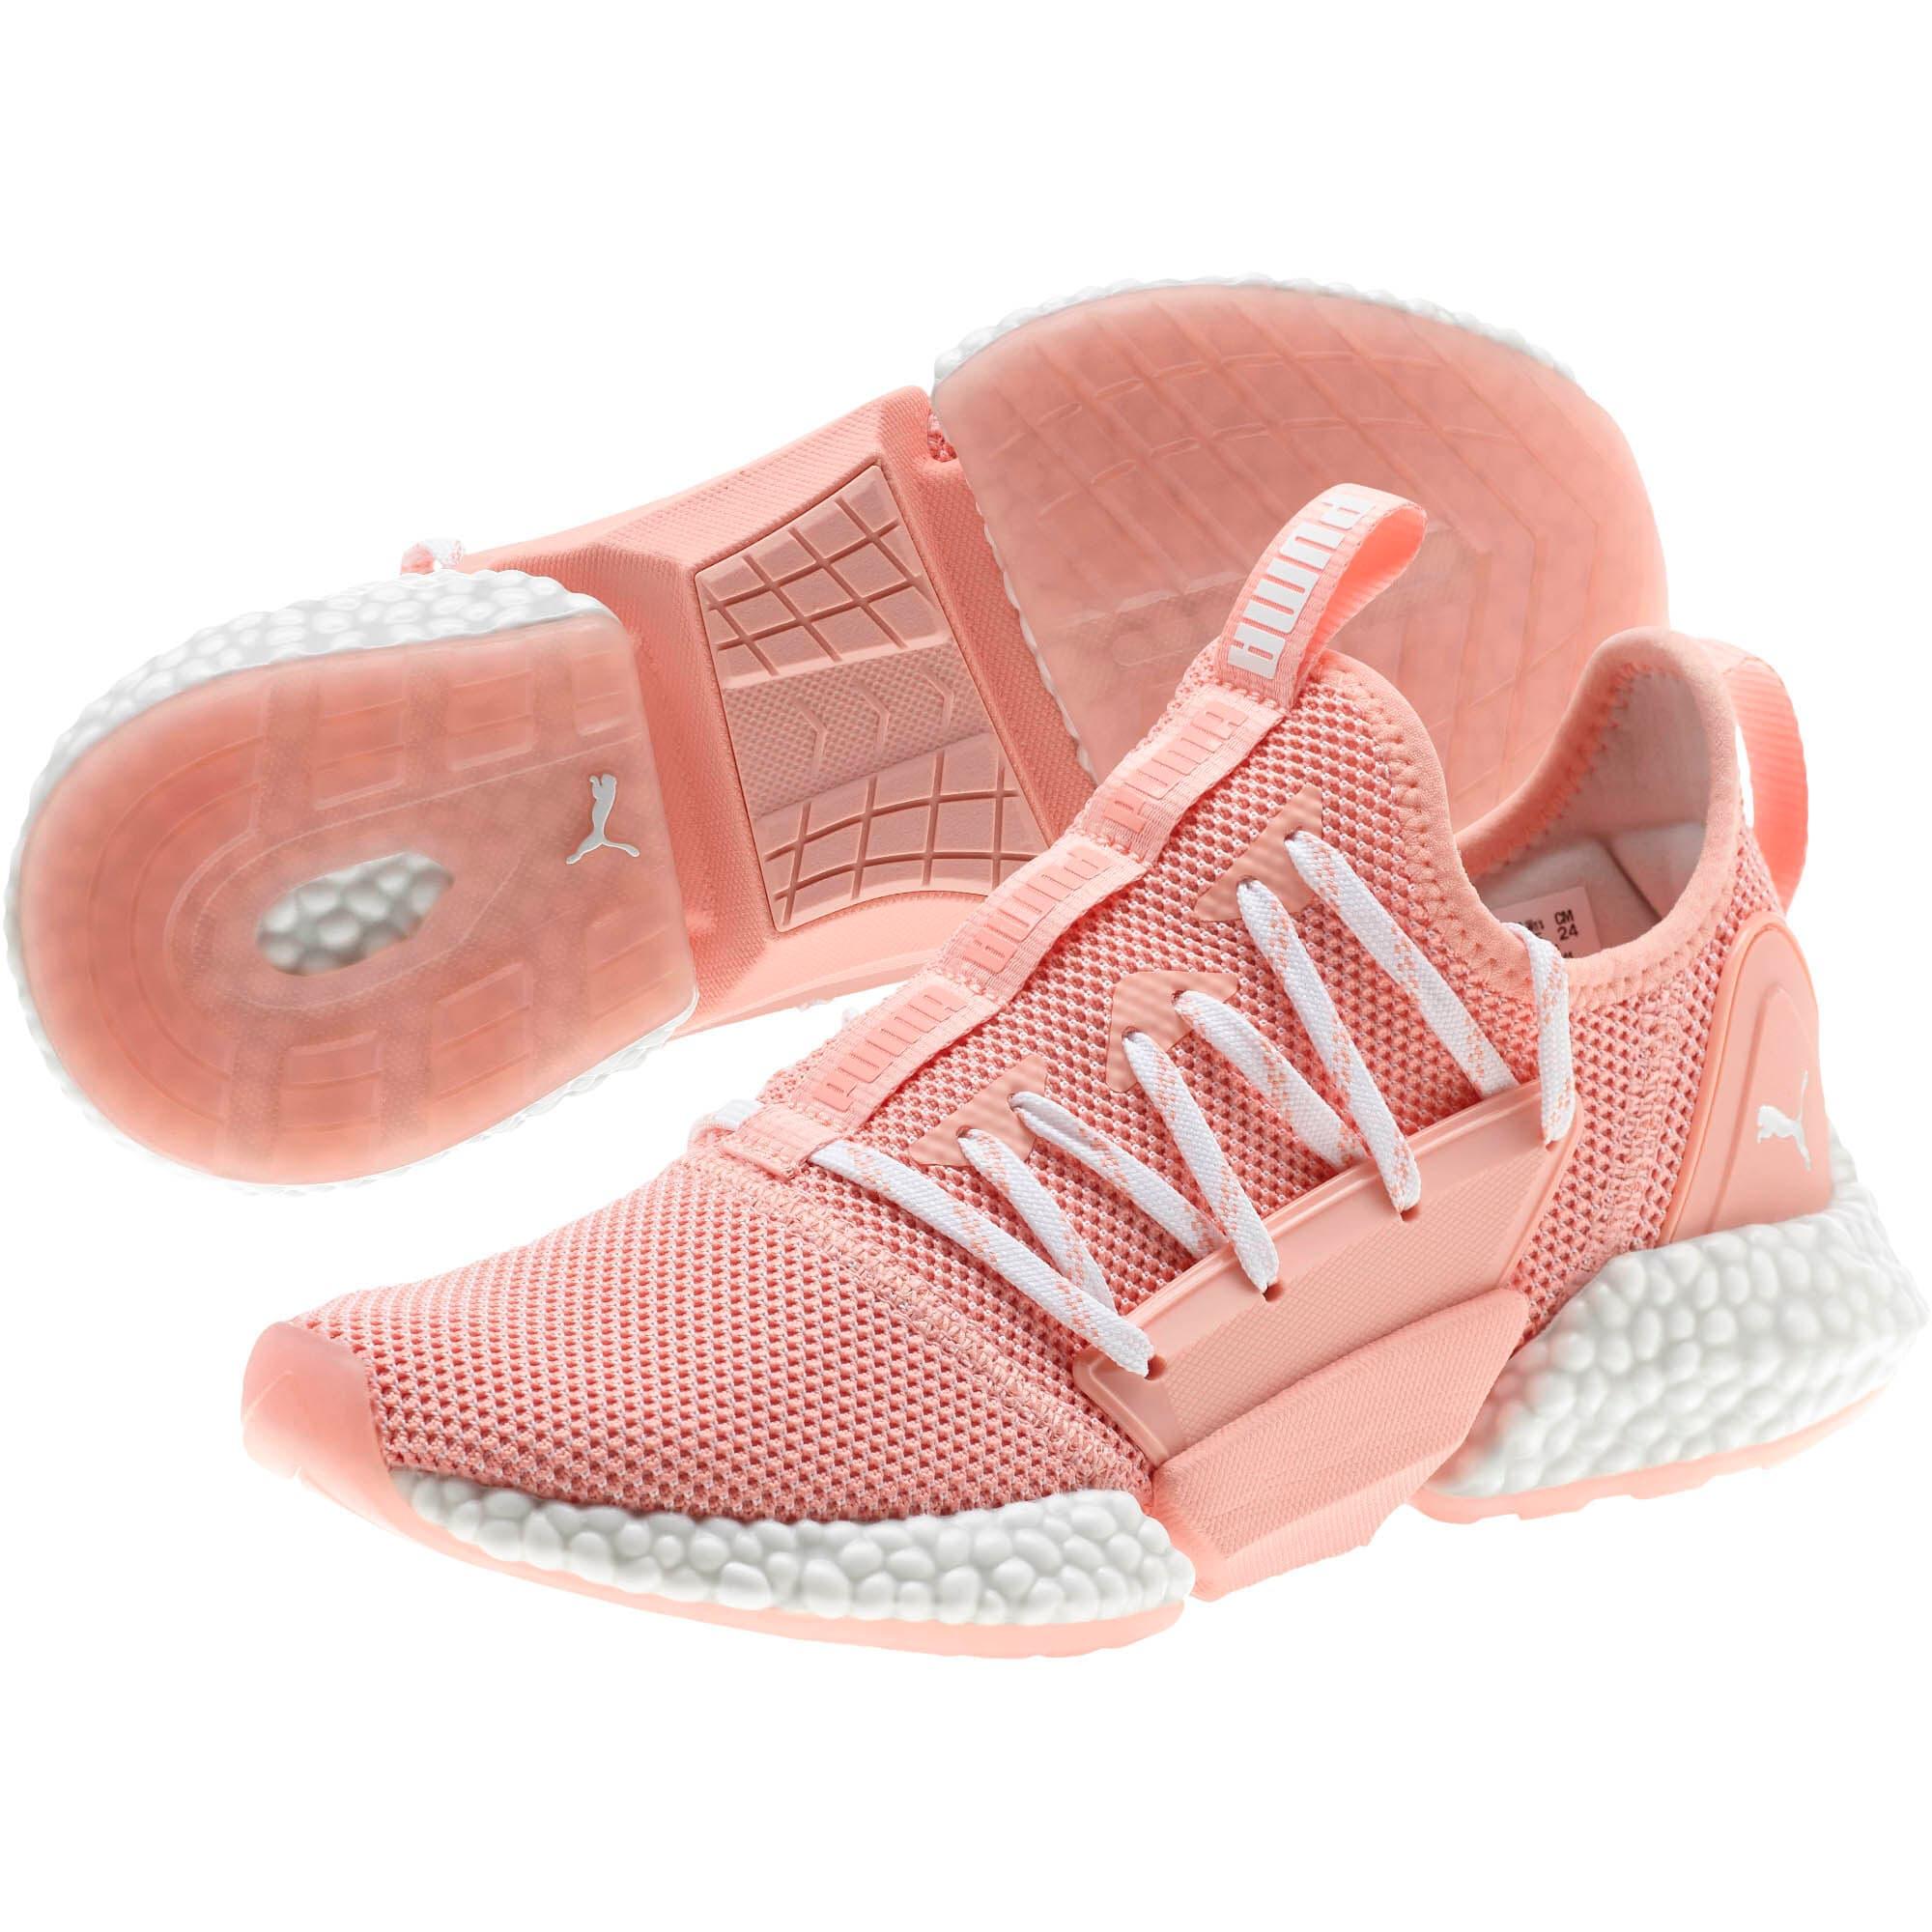 Miniatura 2 de Zapatos para correr HYBRID Rocket Runner para mujer, Peach Bud-Puma White, mediano